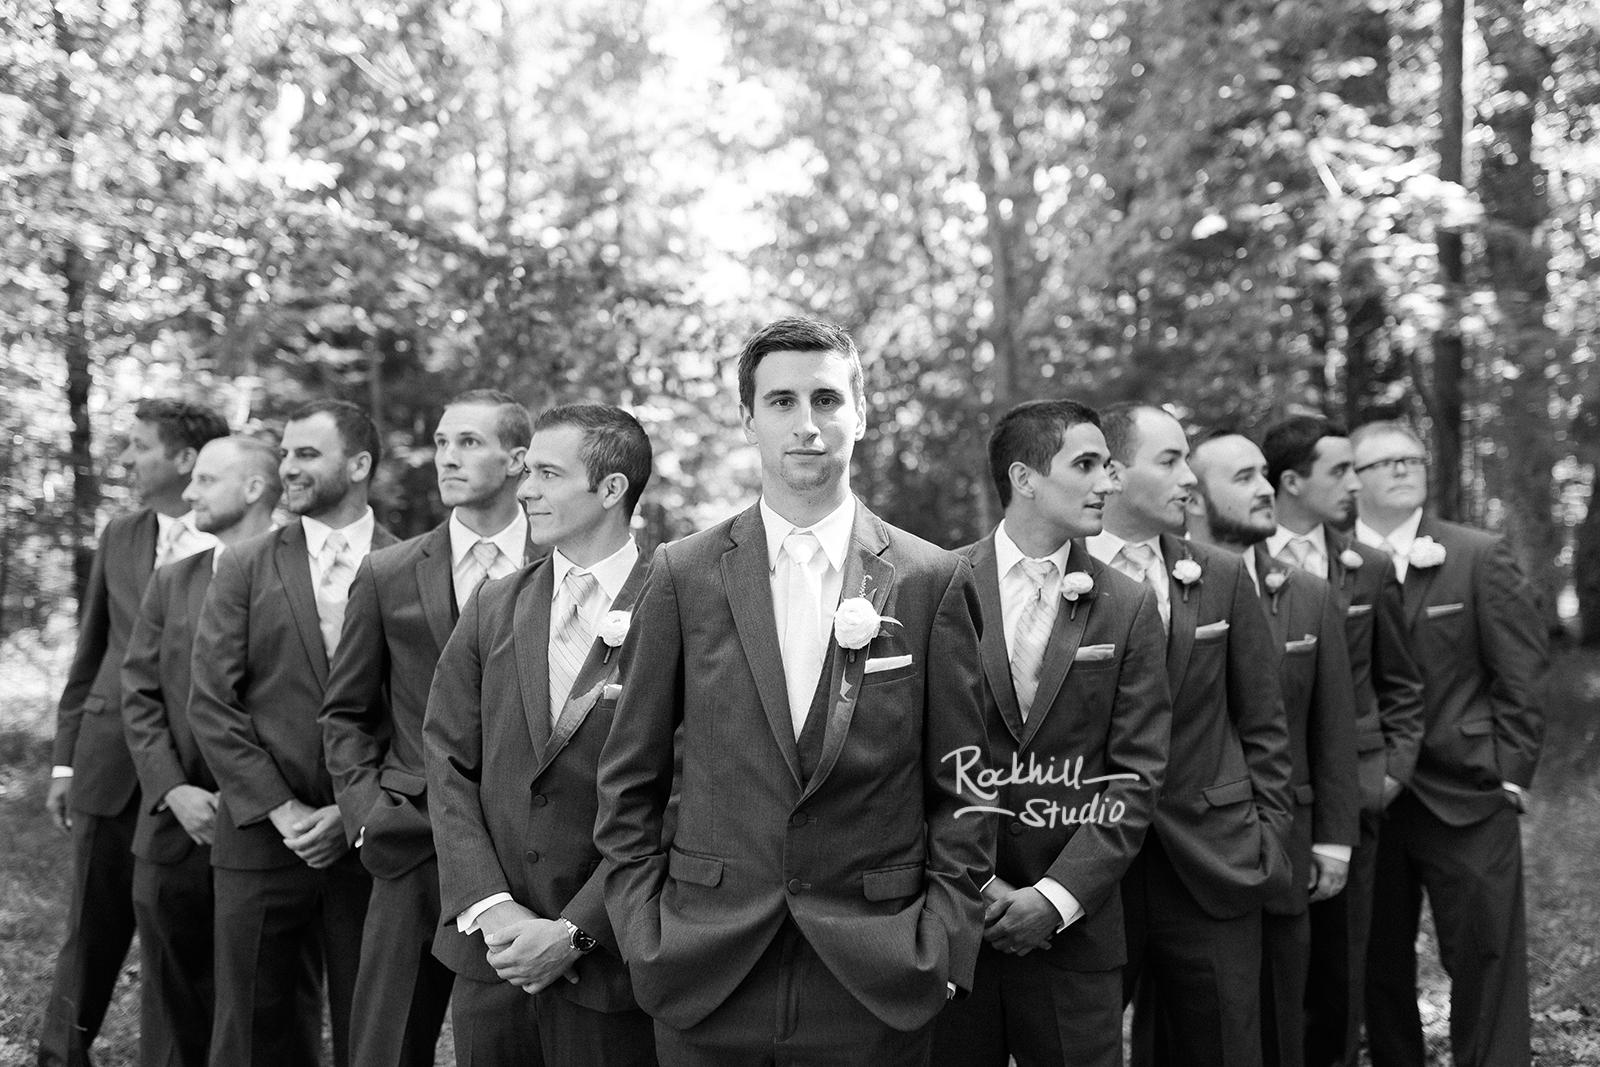 marquette-wedding-upper-peninsula-northern-michigan-wedding-ck-photography-wedding-party-14.jpg